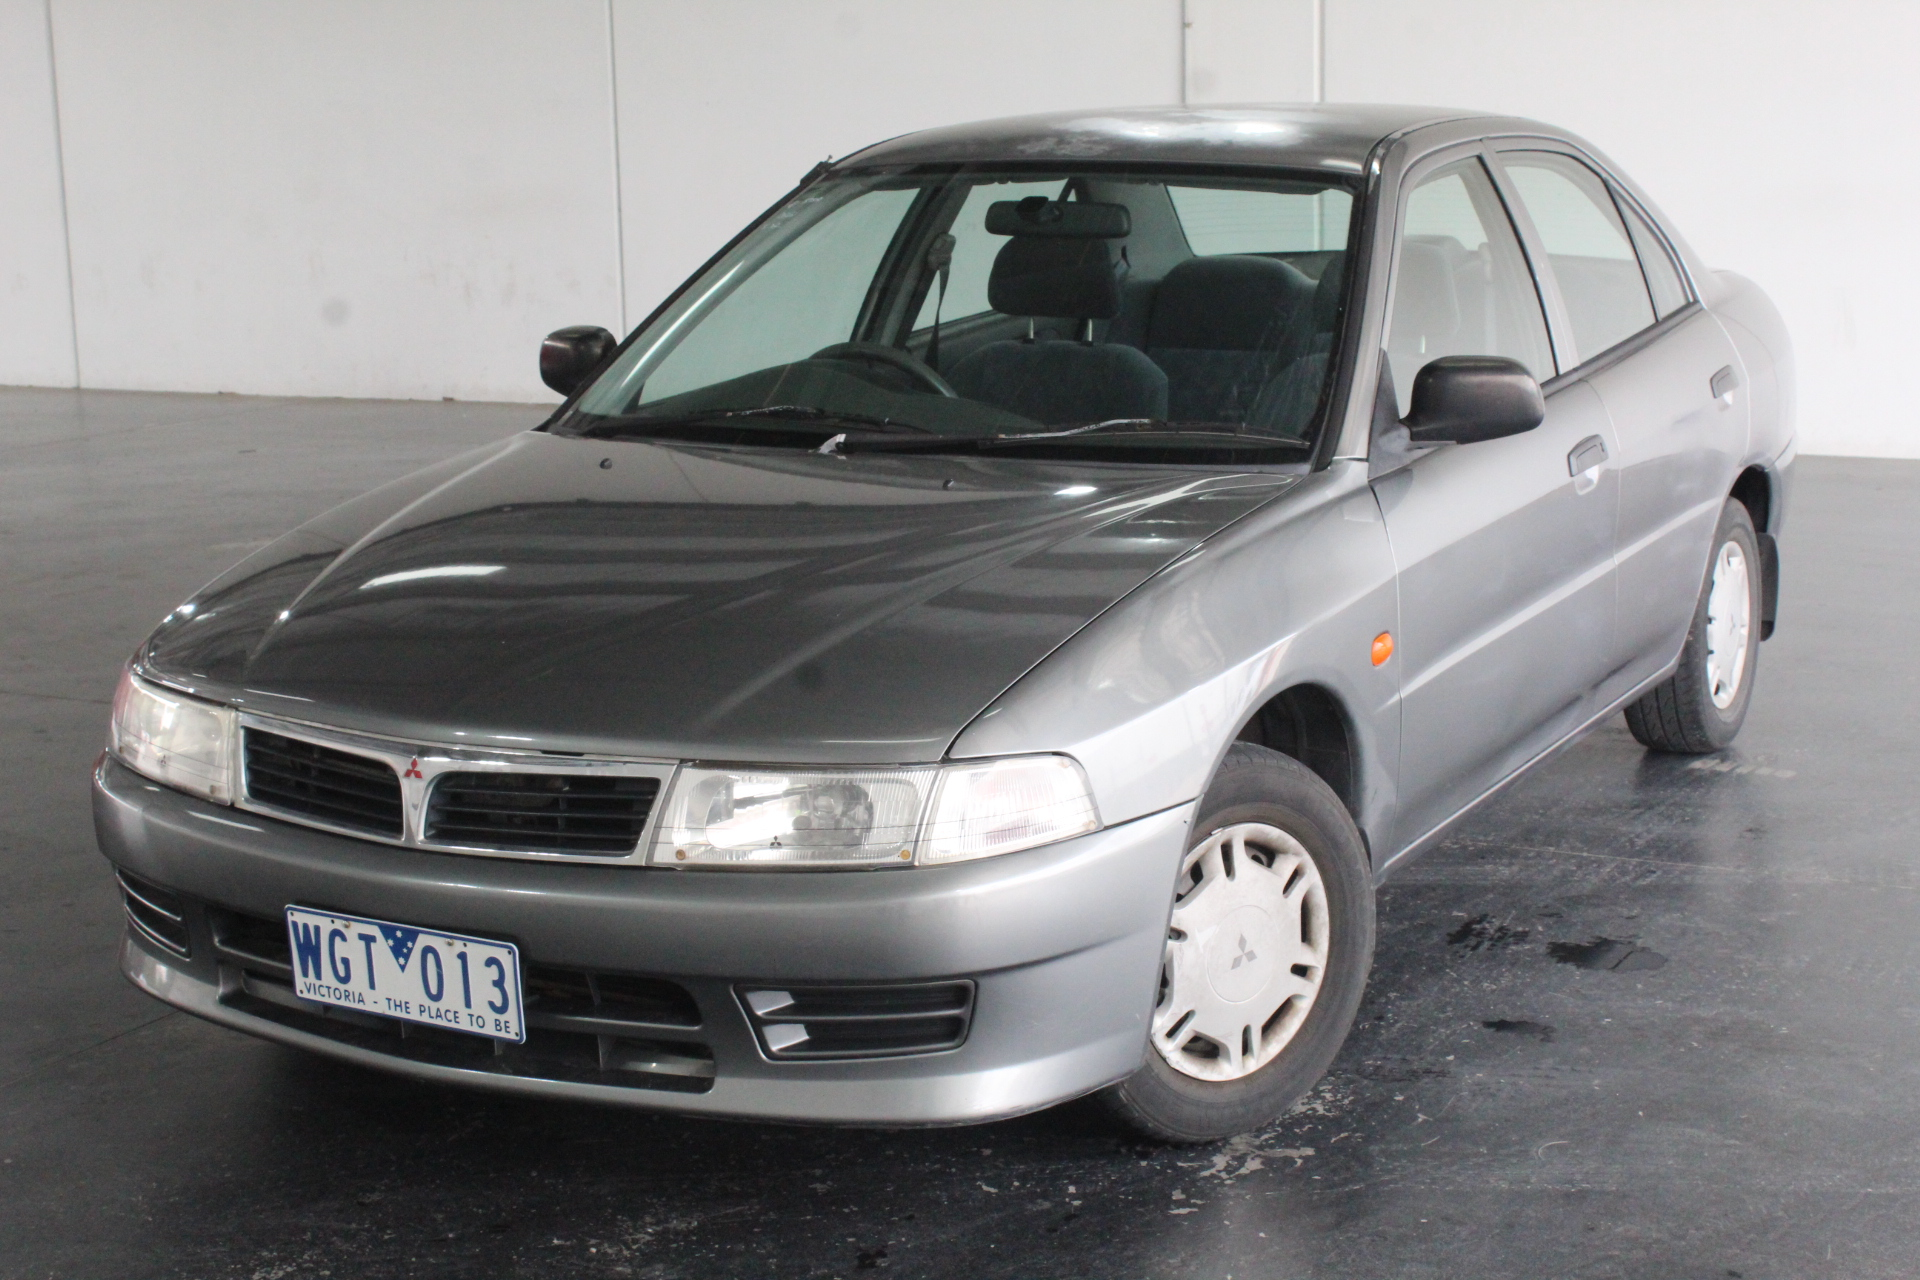 1998 Mitsubishi Lancer GLXi CE Automatic Sedan